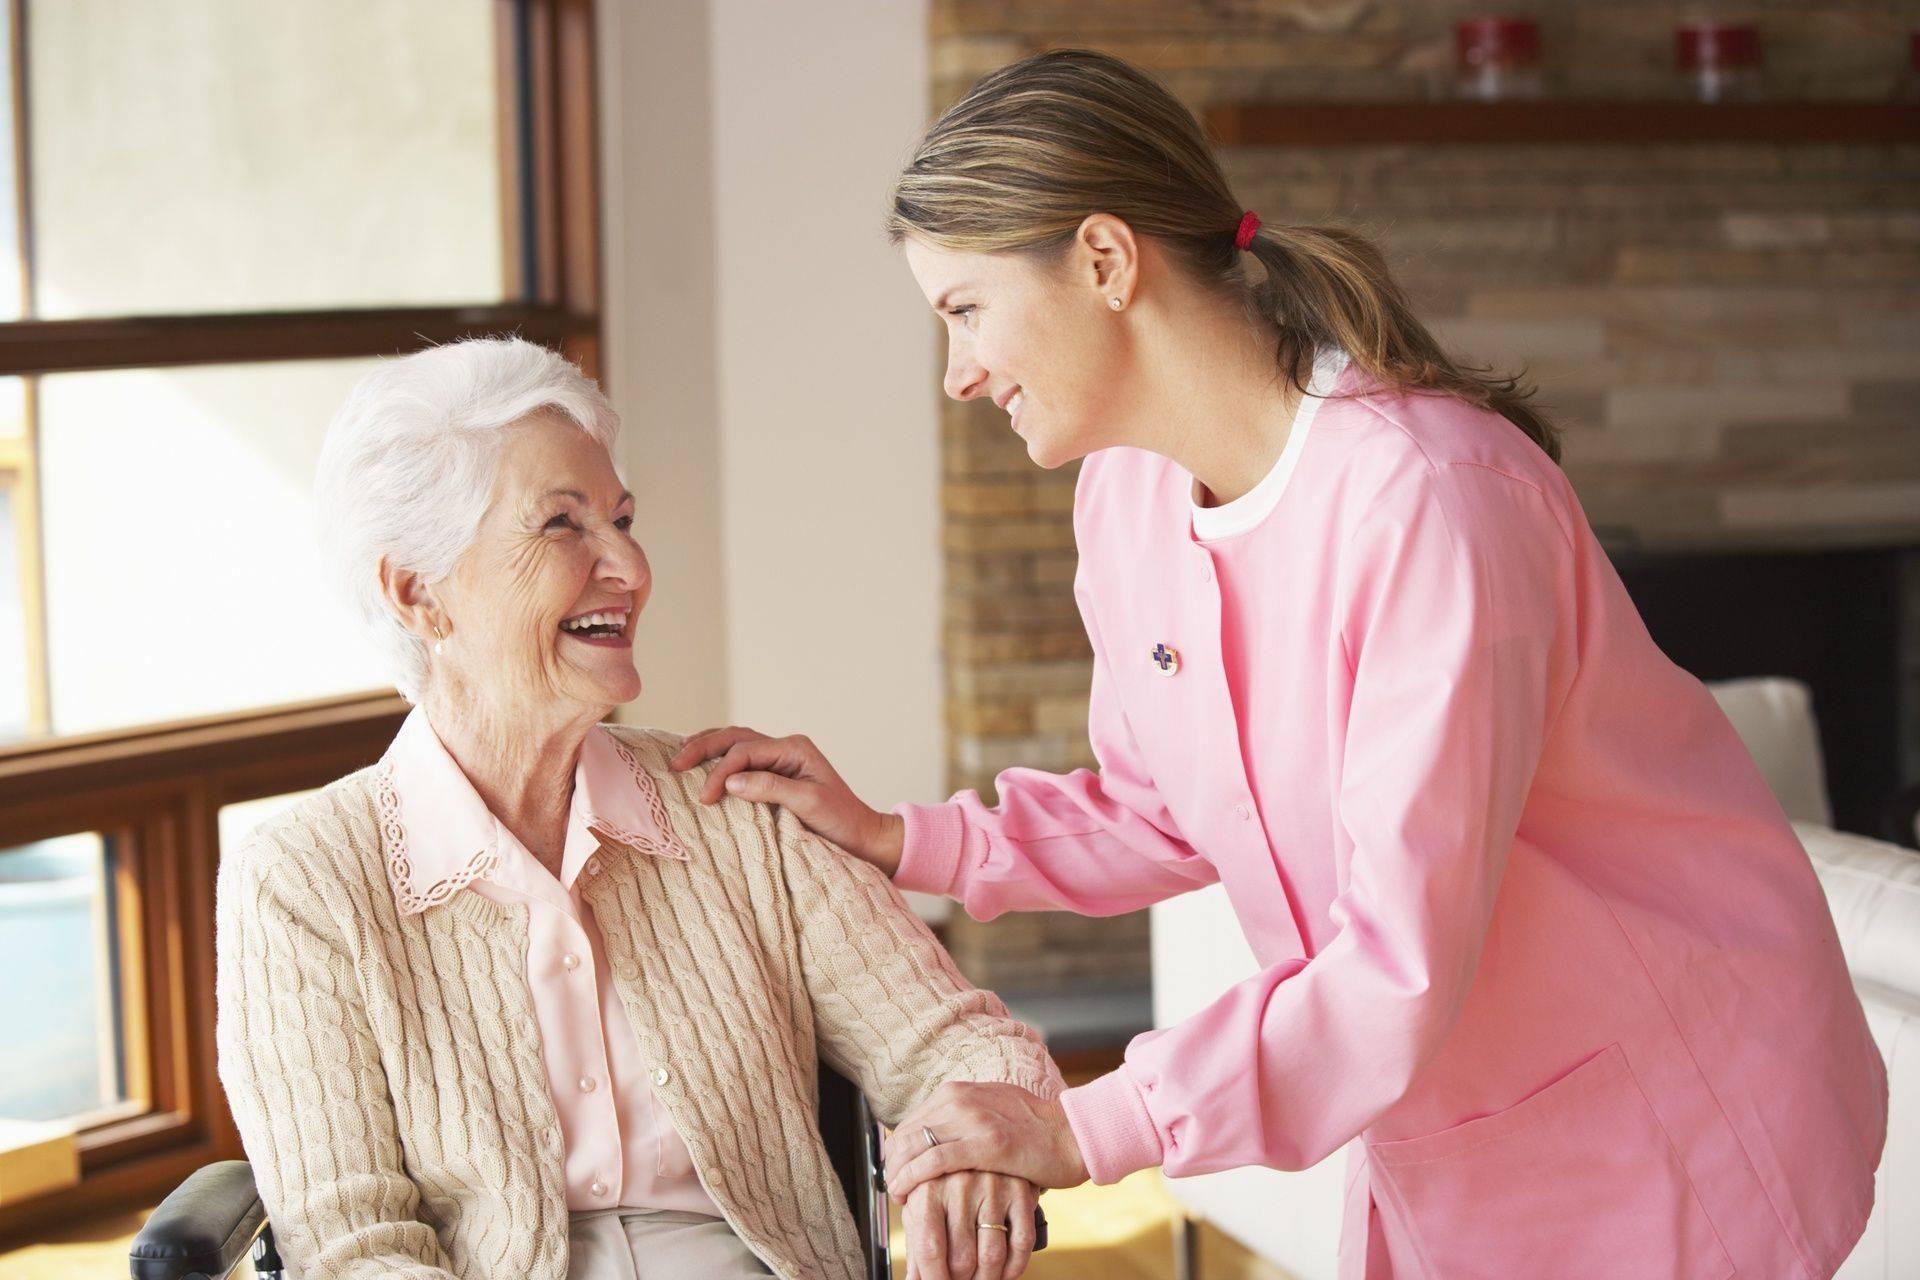 Nurse assisting the elderly lady, companion care